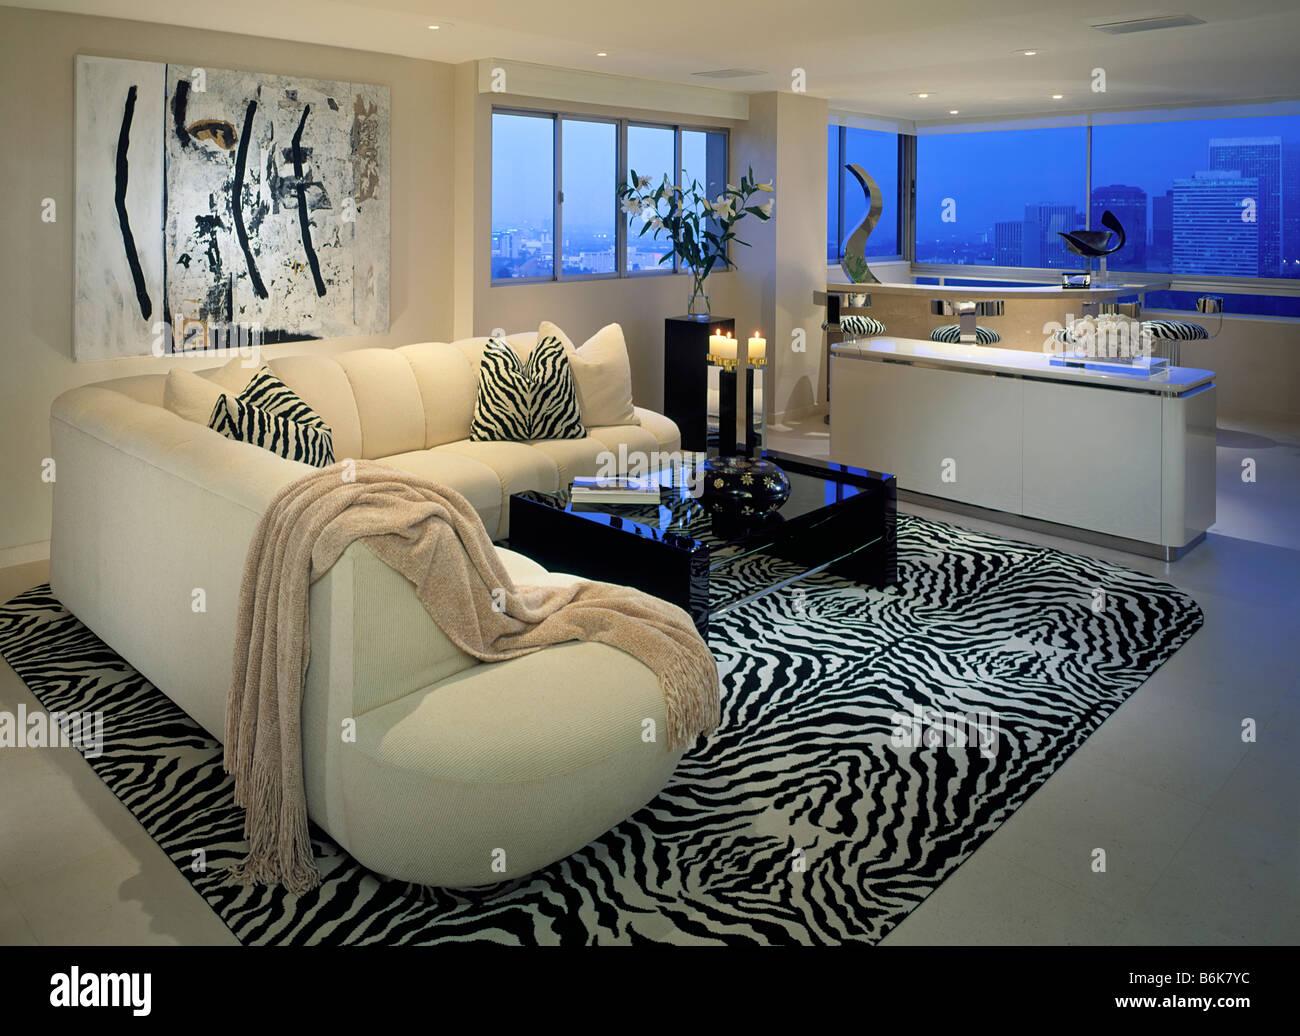 Living room residential, lifestyle, interior, window blue light ...